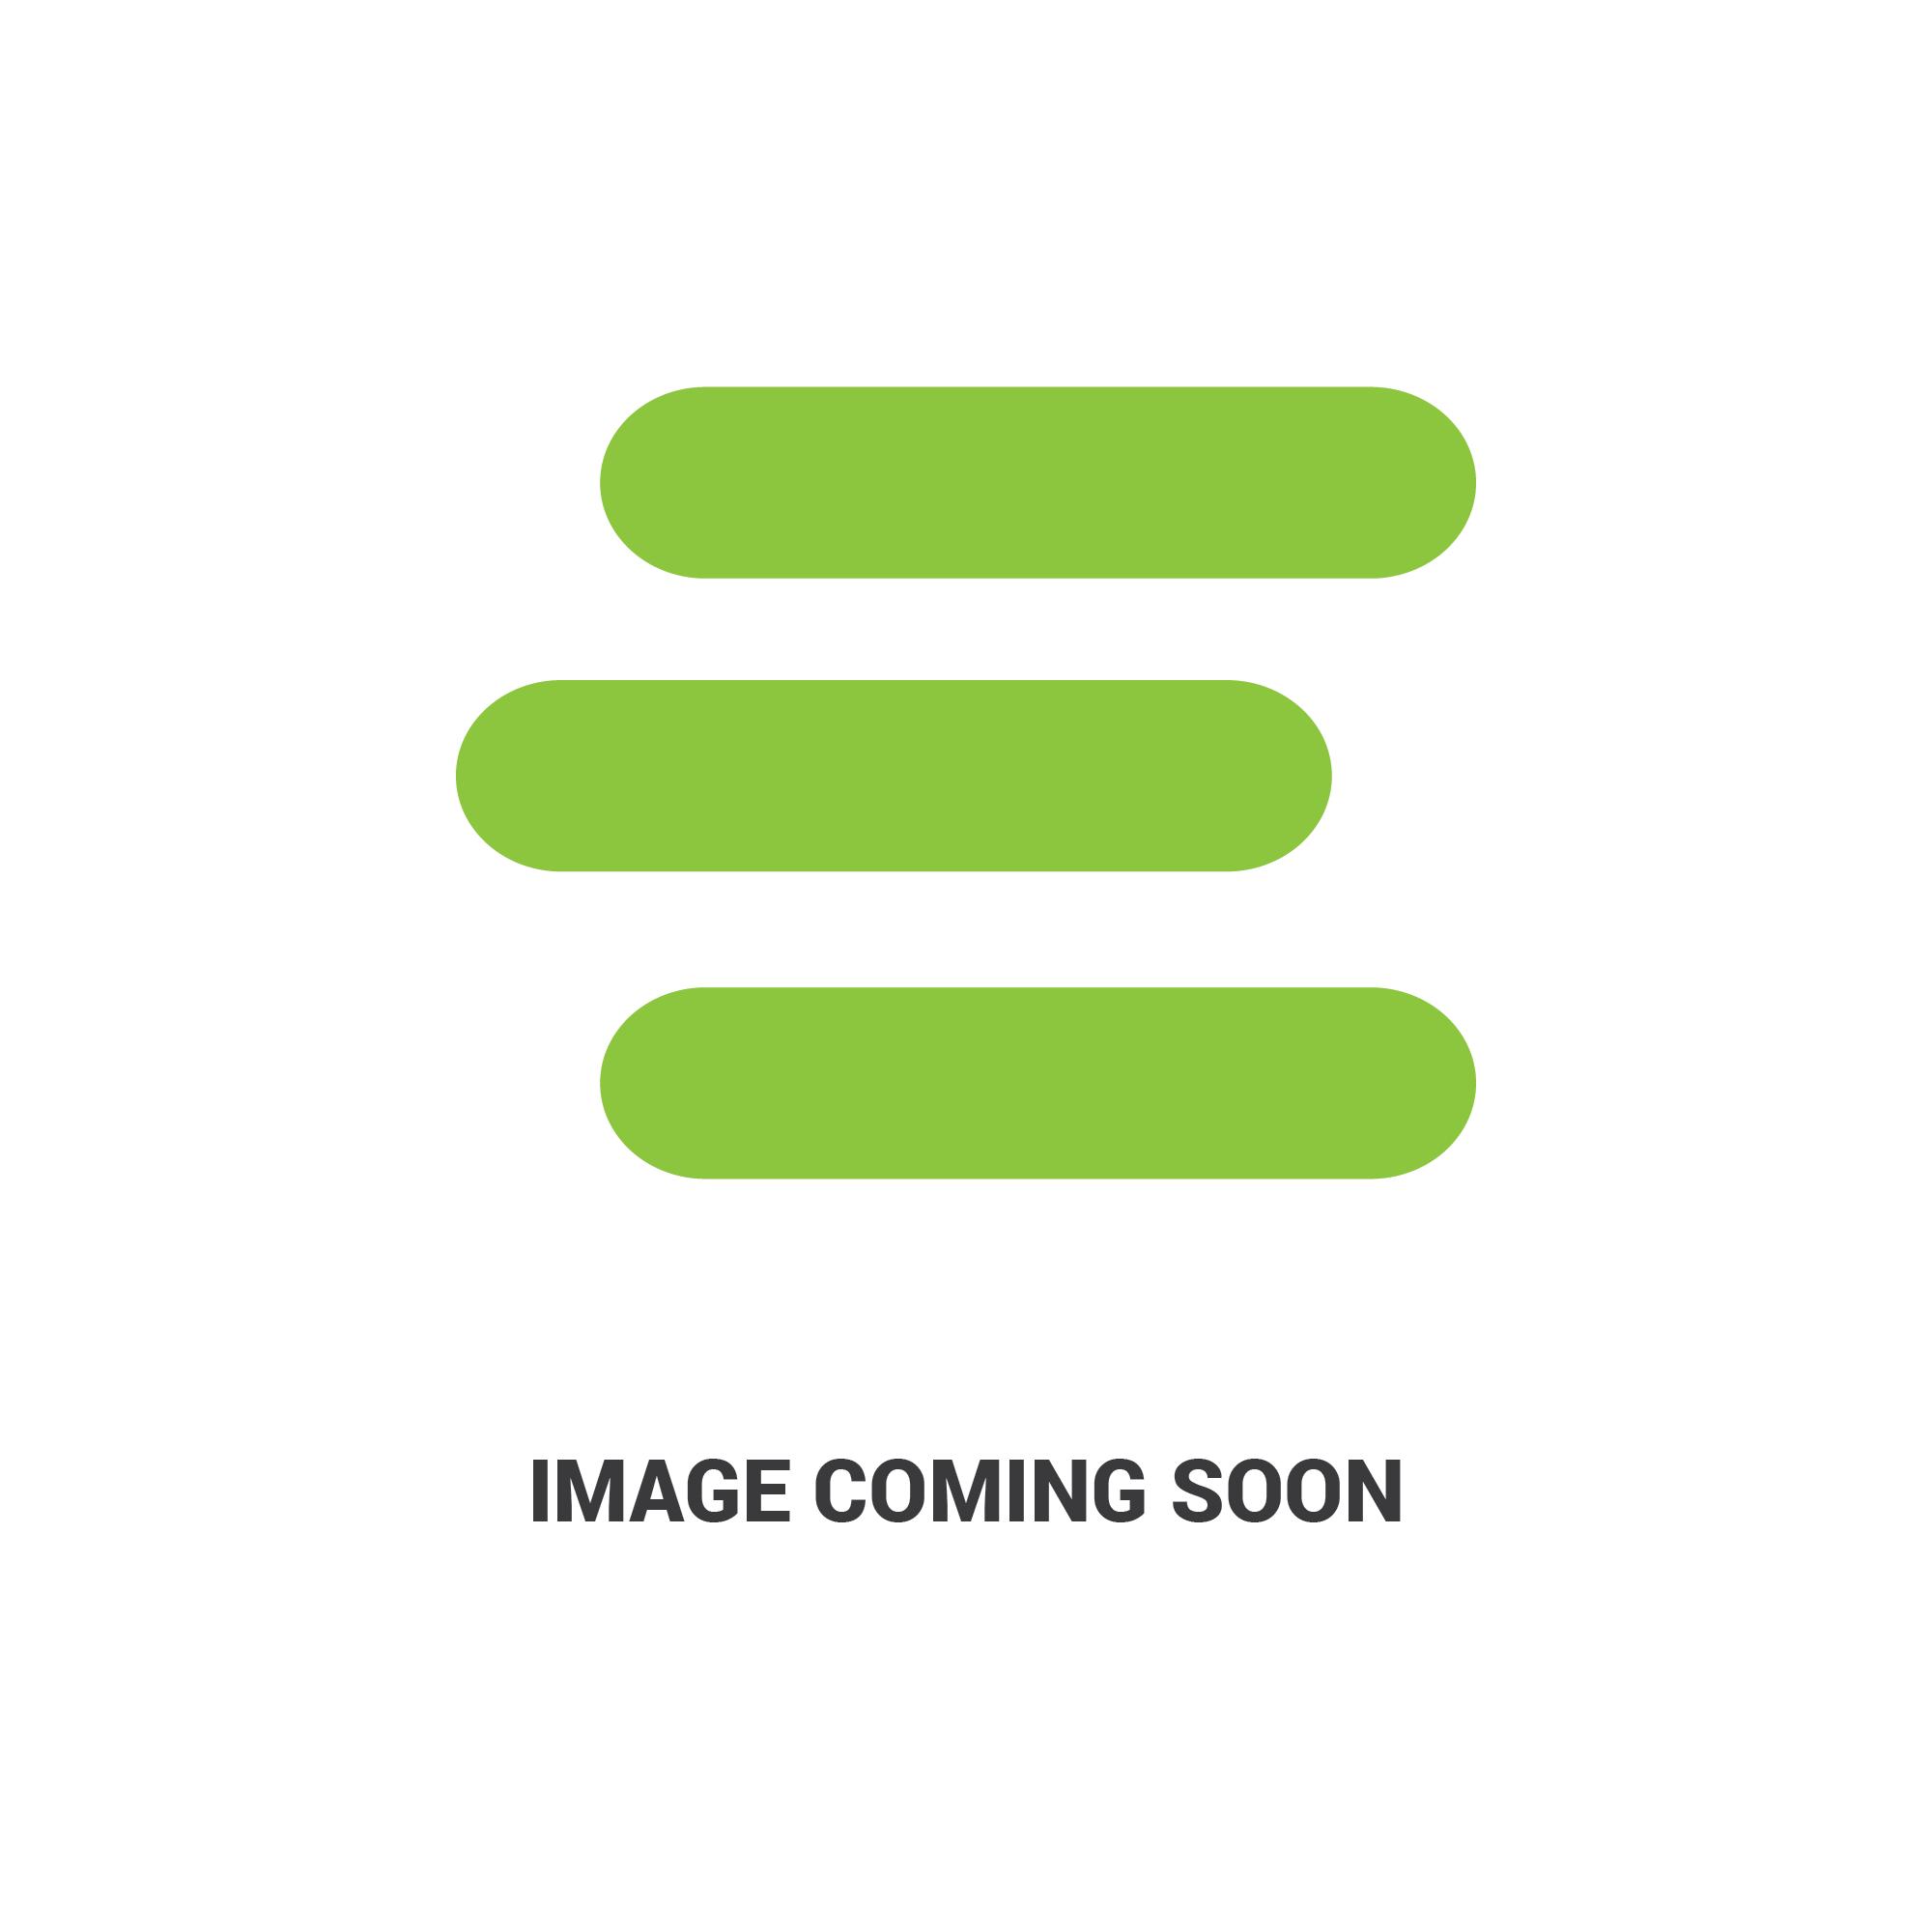 E-62188C1923_1.jpg